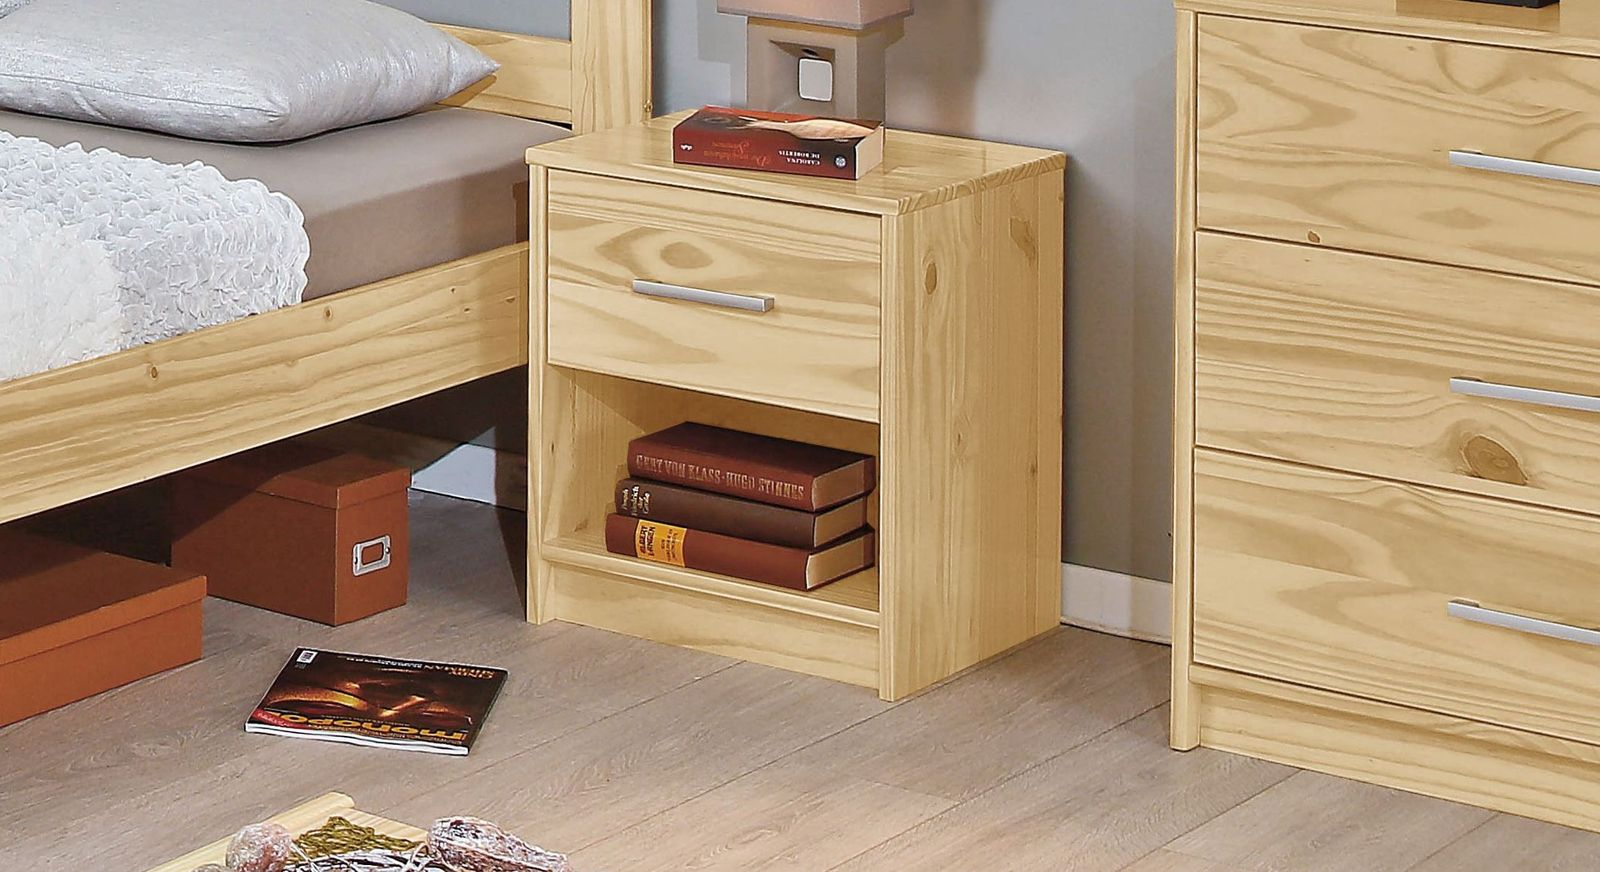 massivholz nachttisch kiefer natur mit schublade g nstig bregenz. Black Bedroom Furniture Sets. Home Design Ideas